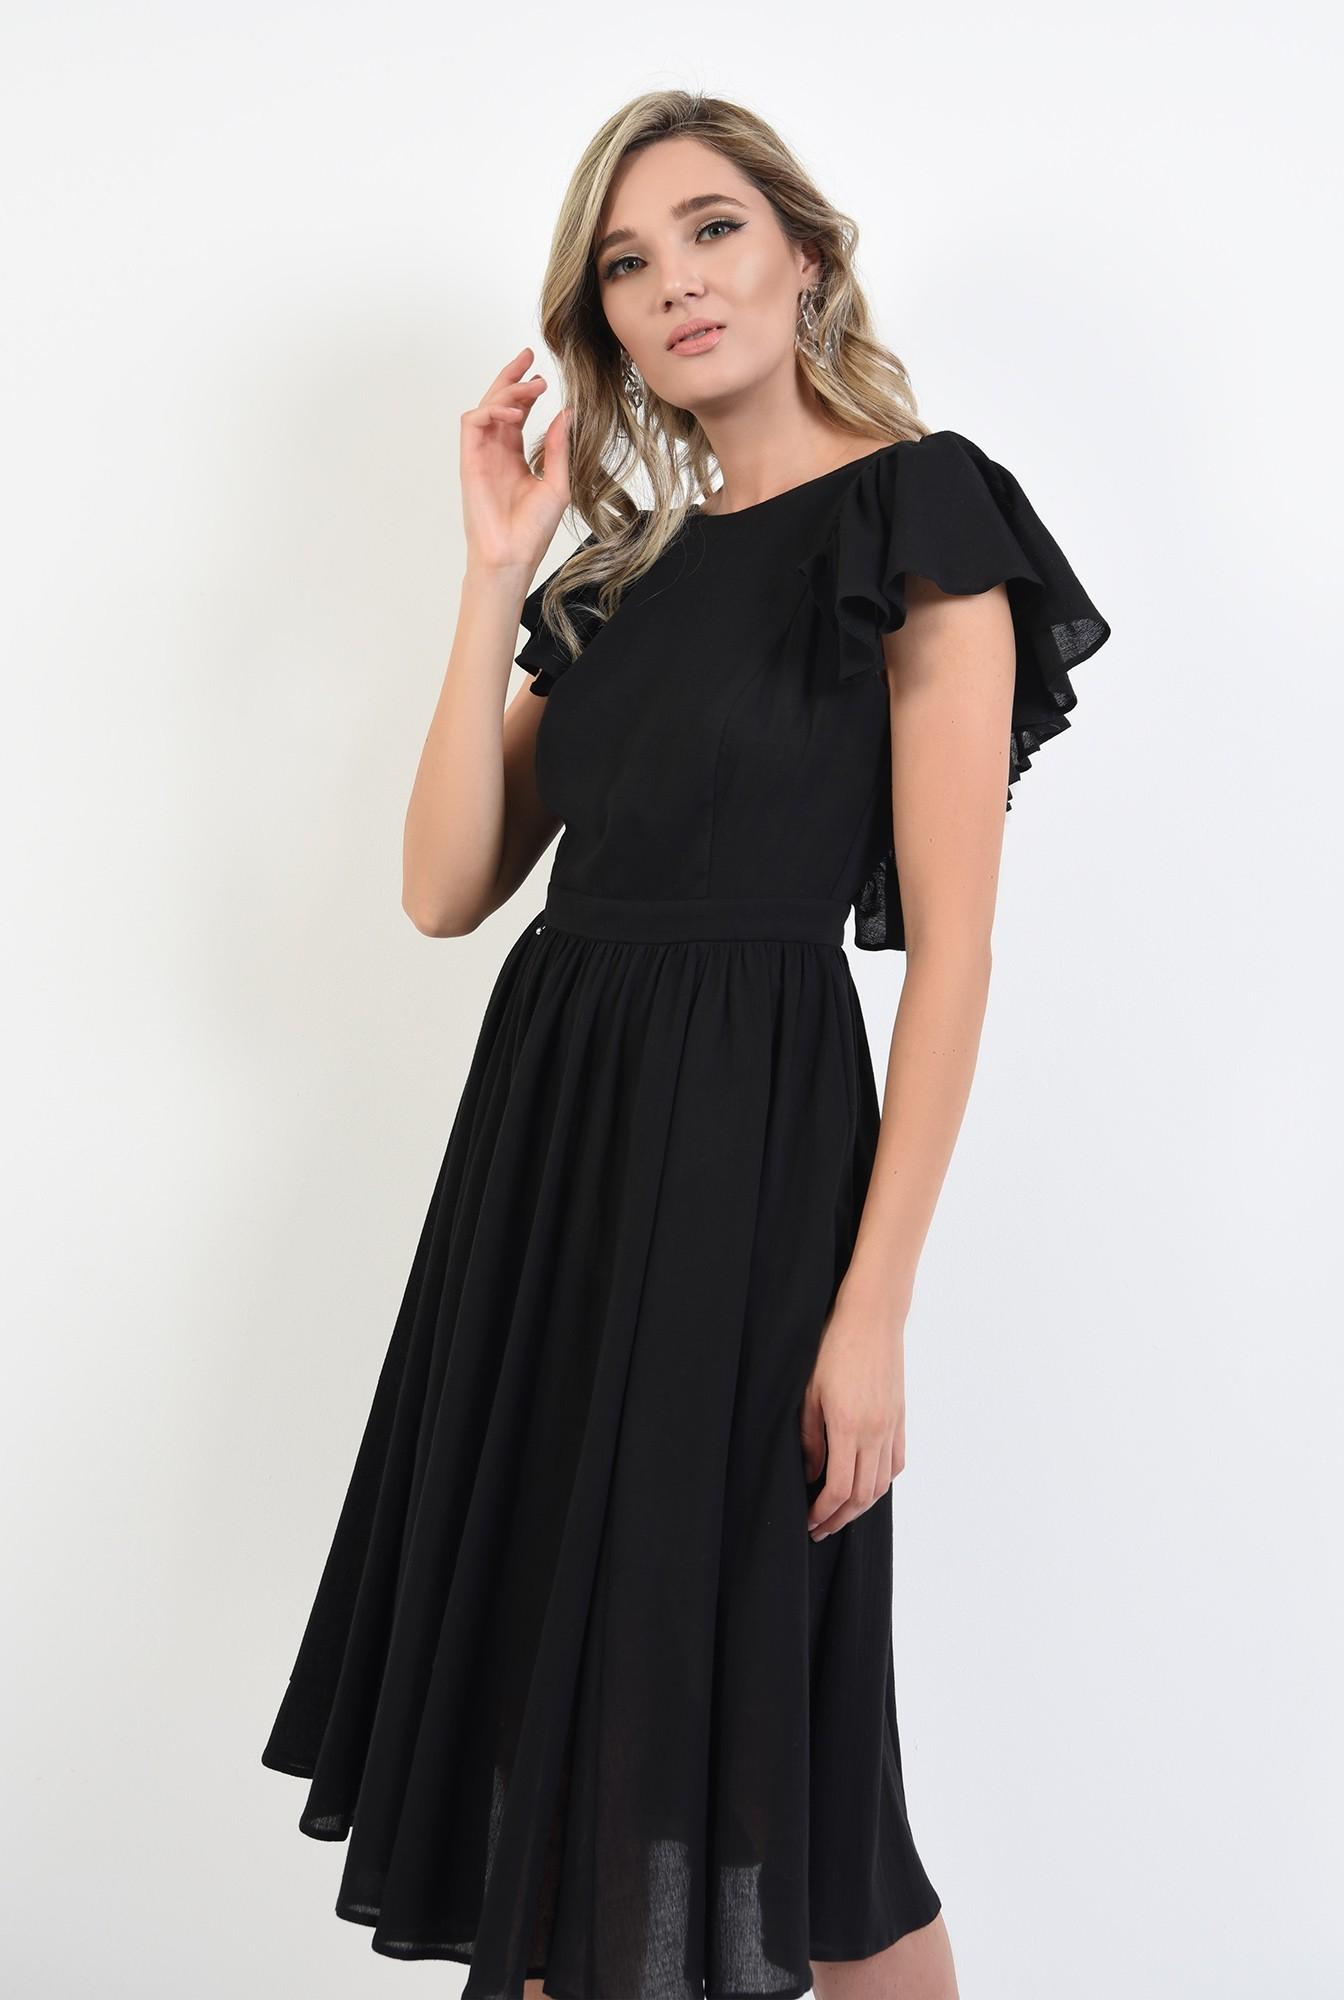 2 - 360 - rochie neagra, cu spate gol, evazata, midi, Poema